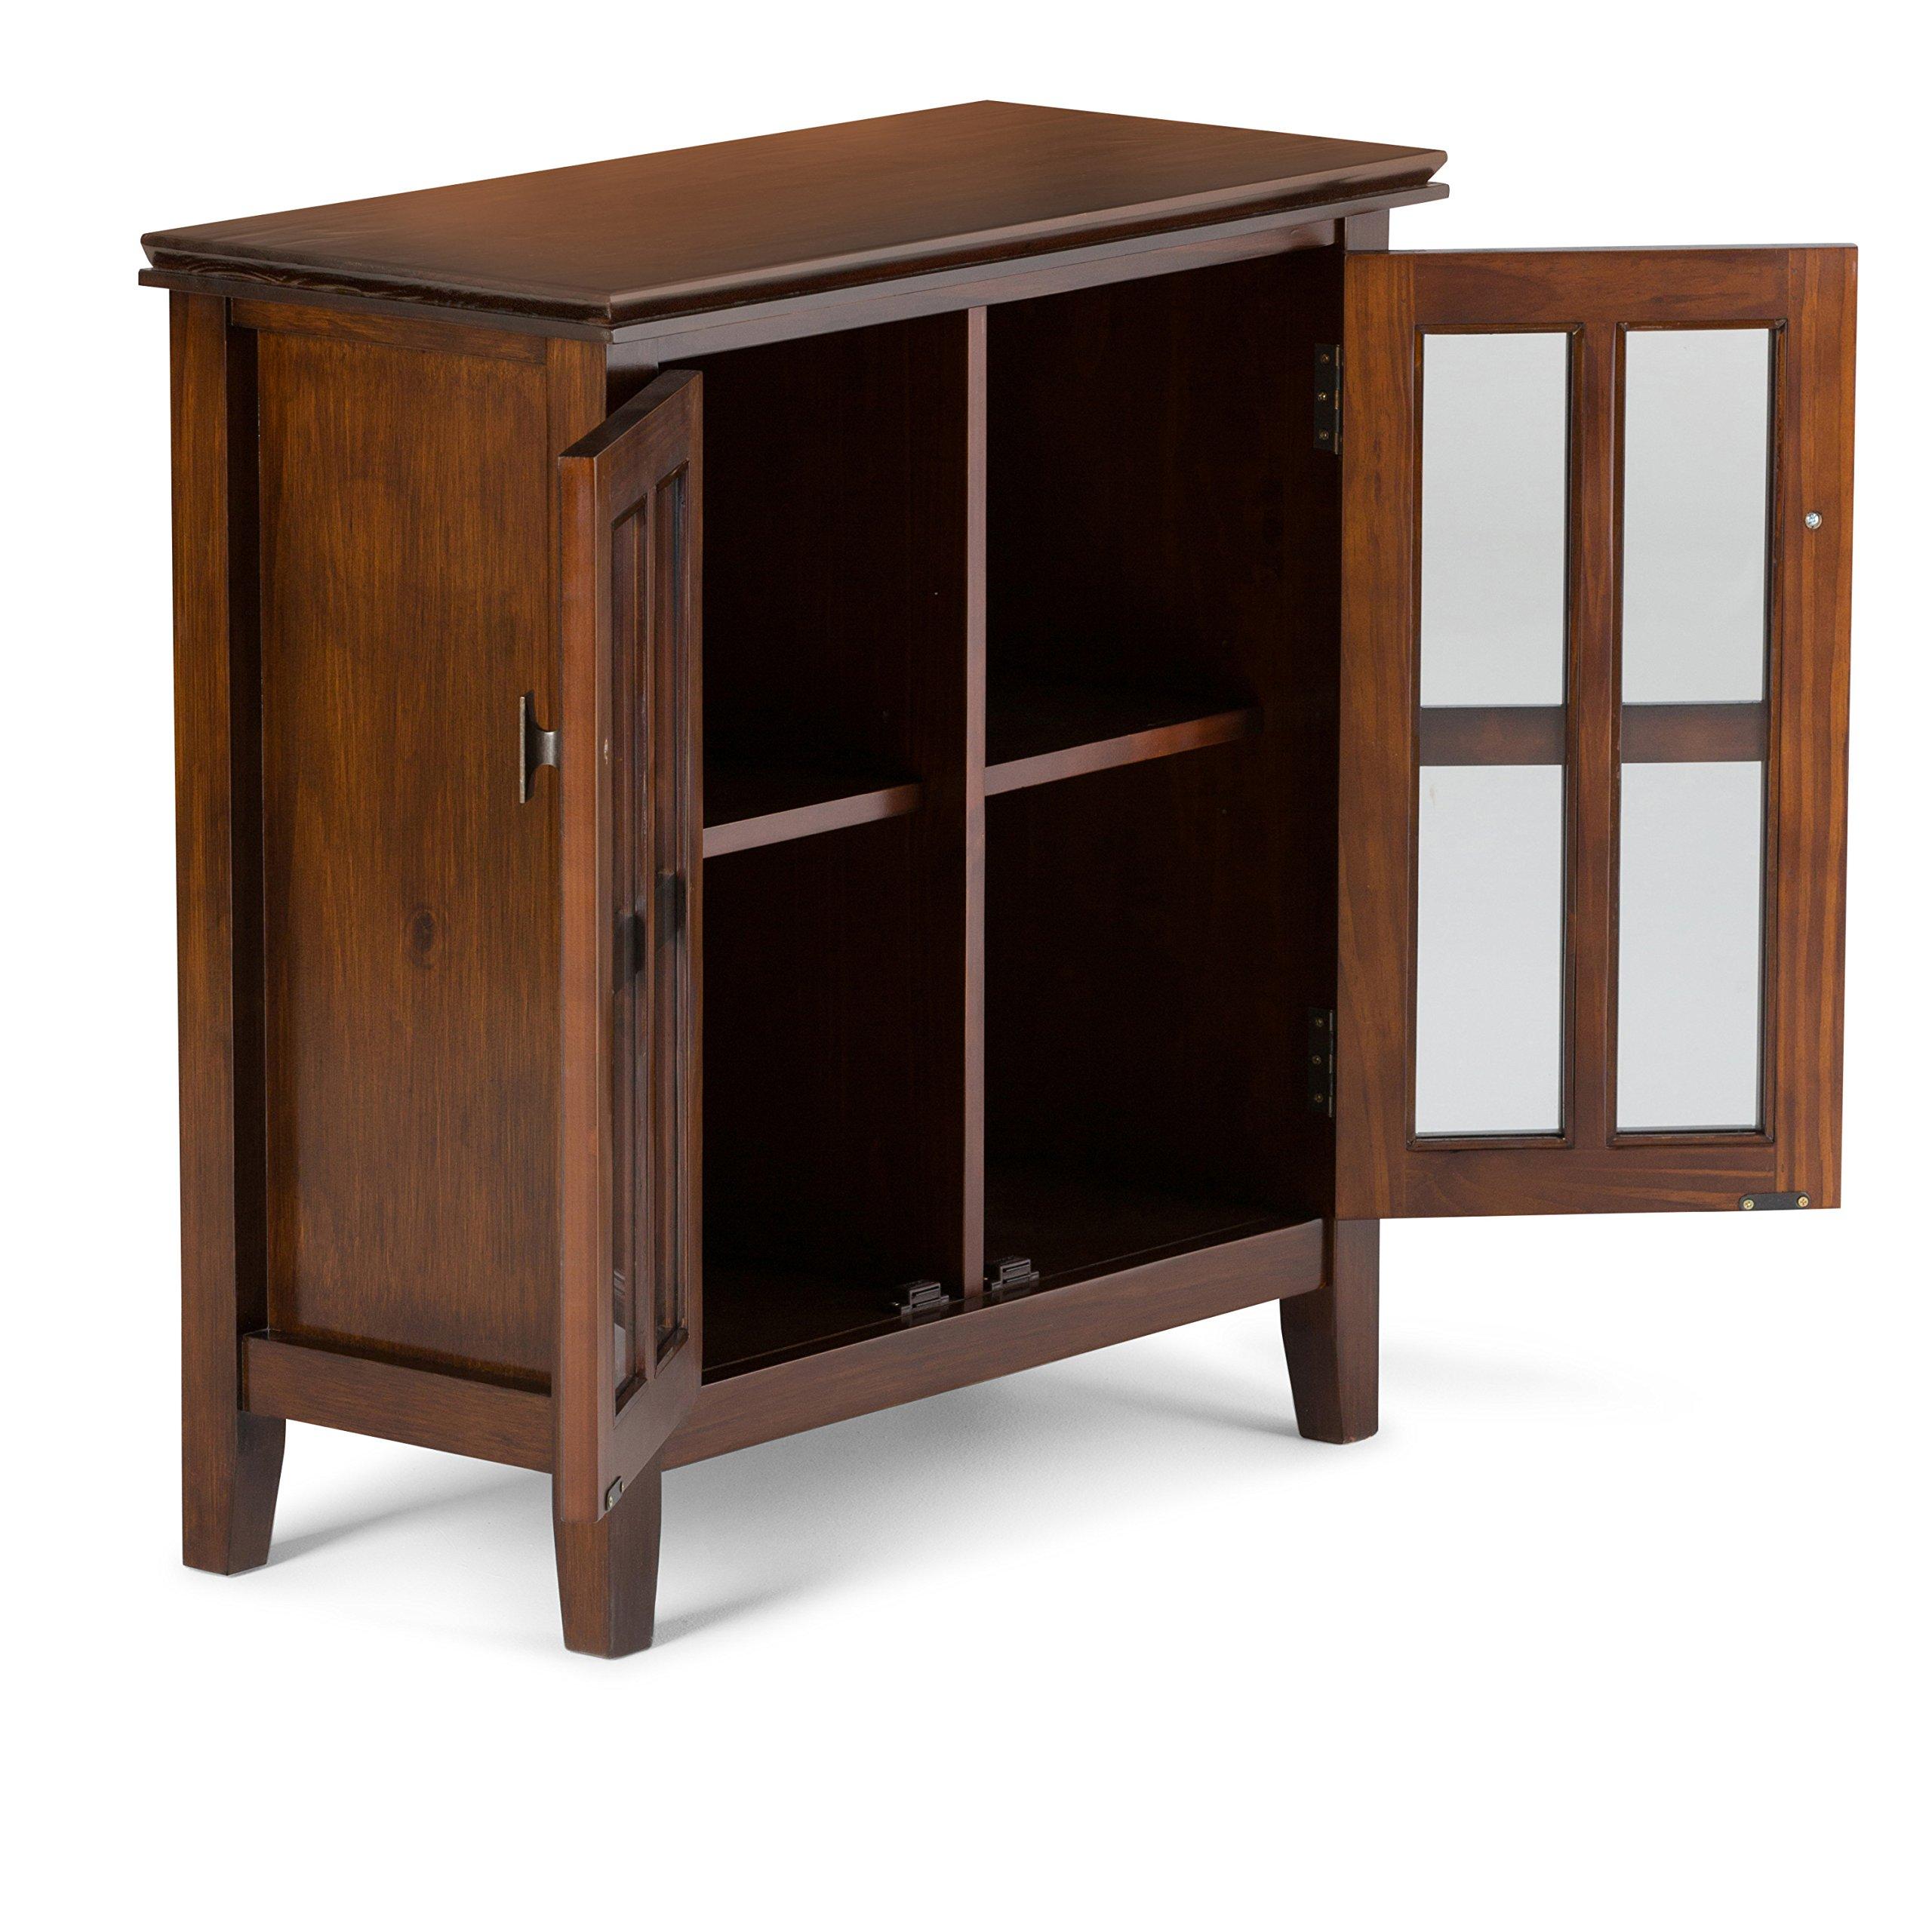 Simpli Home Artisan Solid Wood Low Storage Cabinet, Medium Auburn Brown by Simpli Home (Image #3)